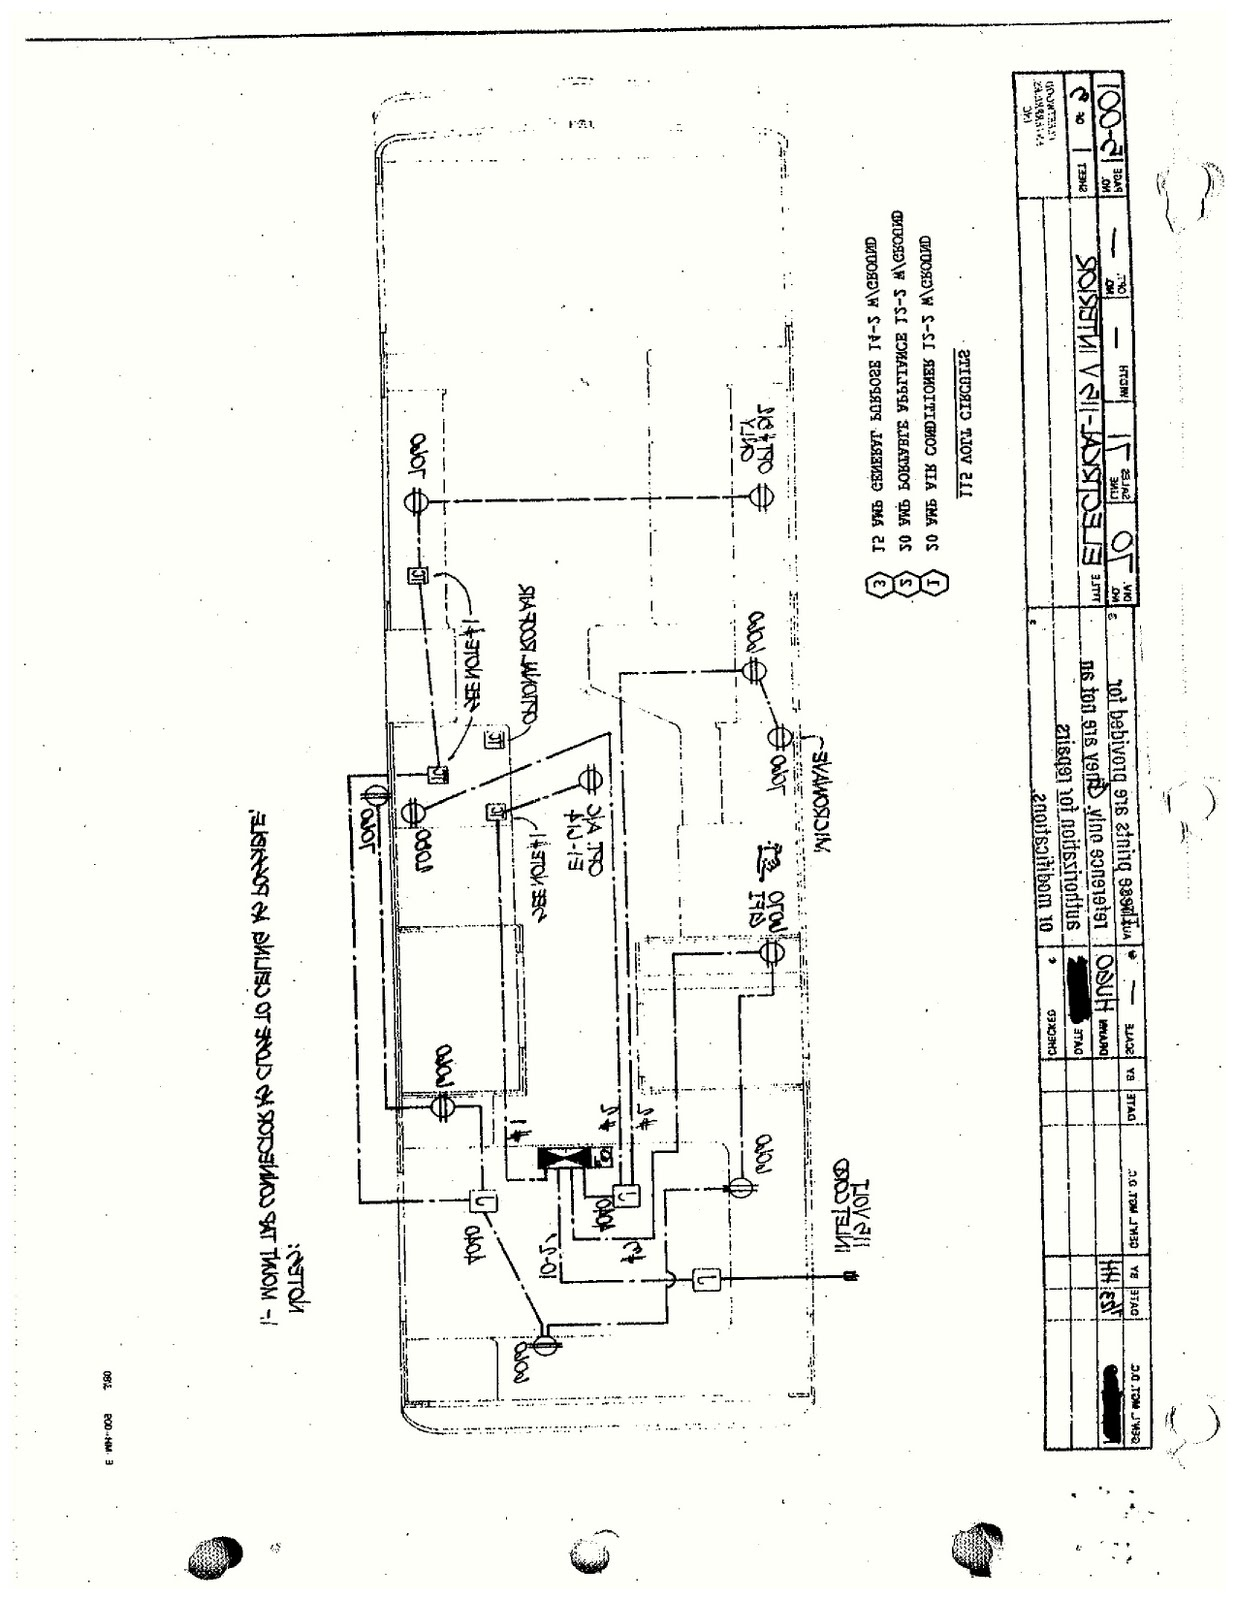 small resolution of fleetwood mallard trailer wiring diagram simple wiring diagram 1992 fleetwood motorhome wiring diagram fleetwood mallard wiring